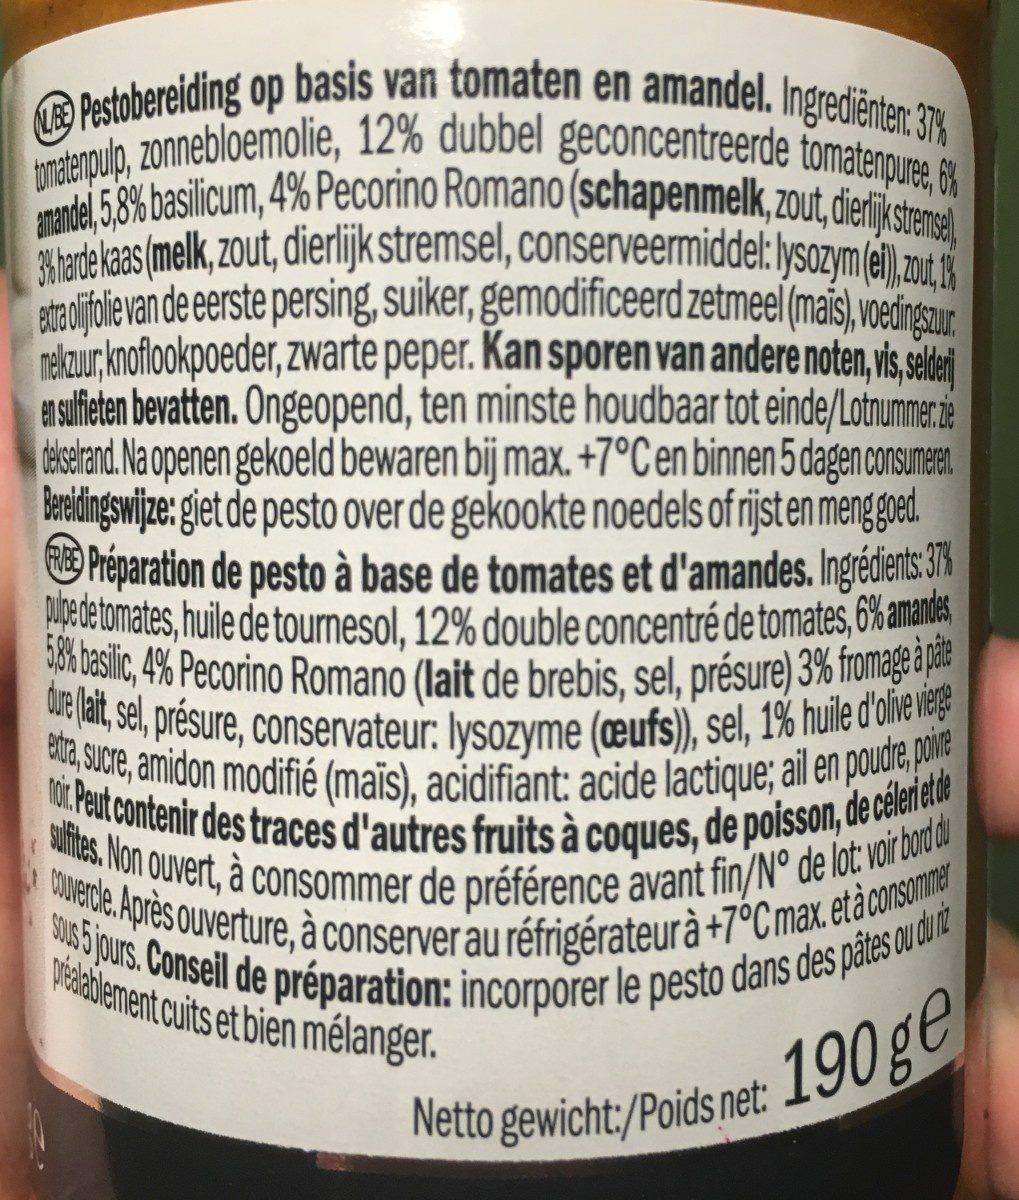 Tomaten-Mandel Pesto - Ingrédients - fr